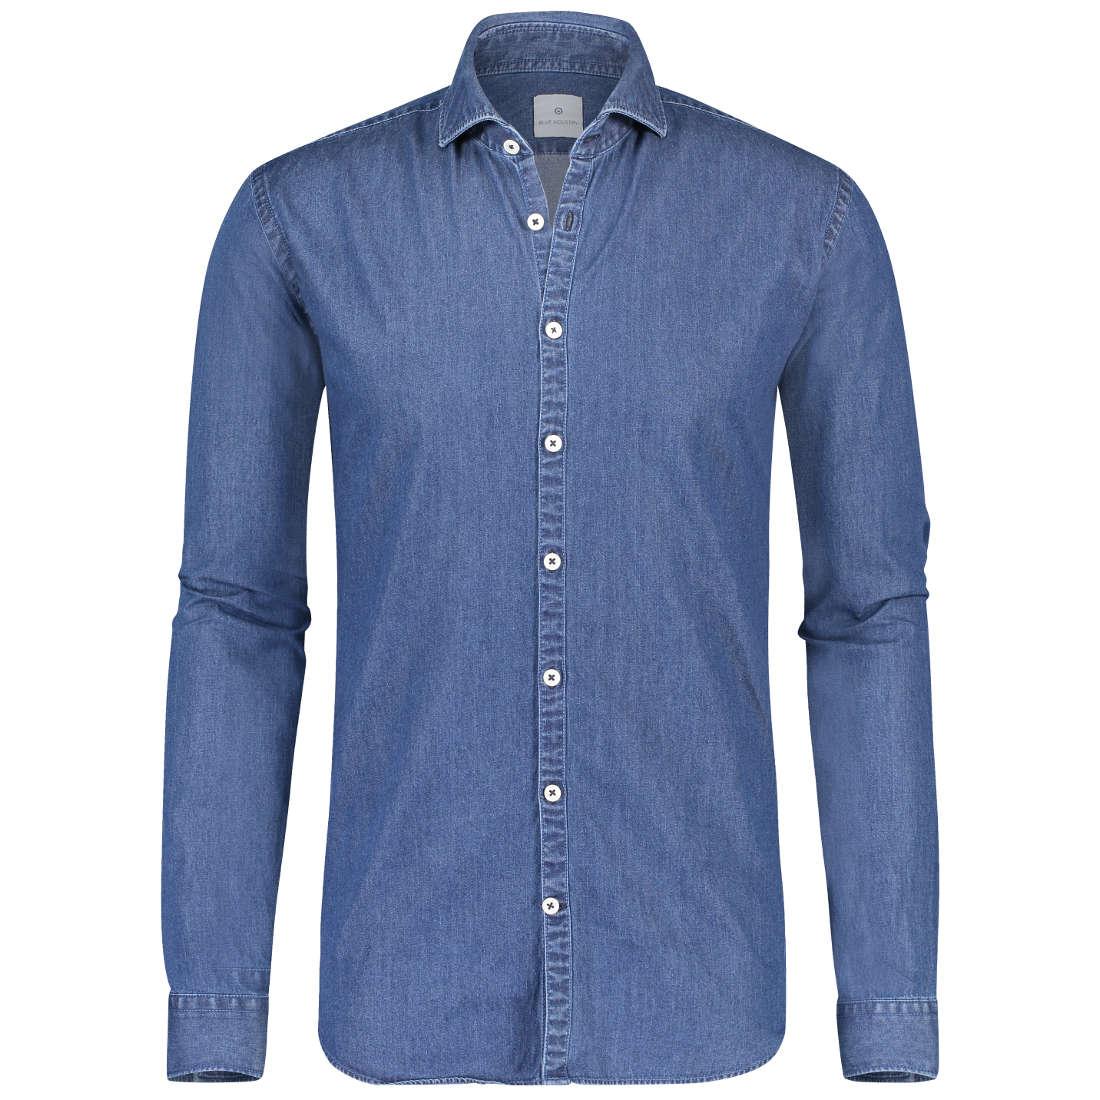 Blue Industry overhemd 1242-91 in het Stonewash